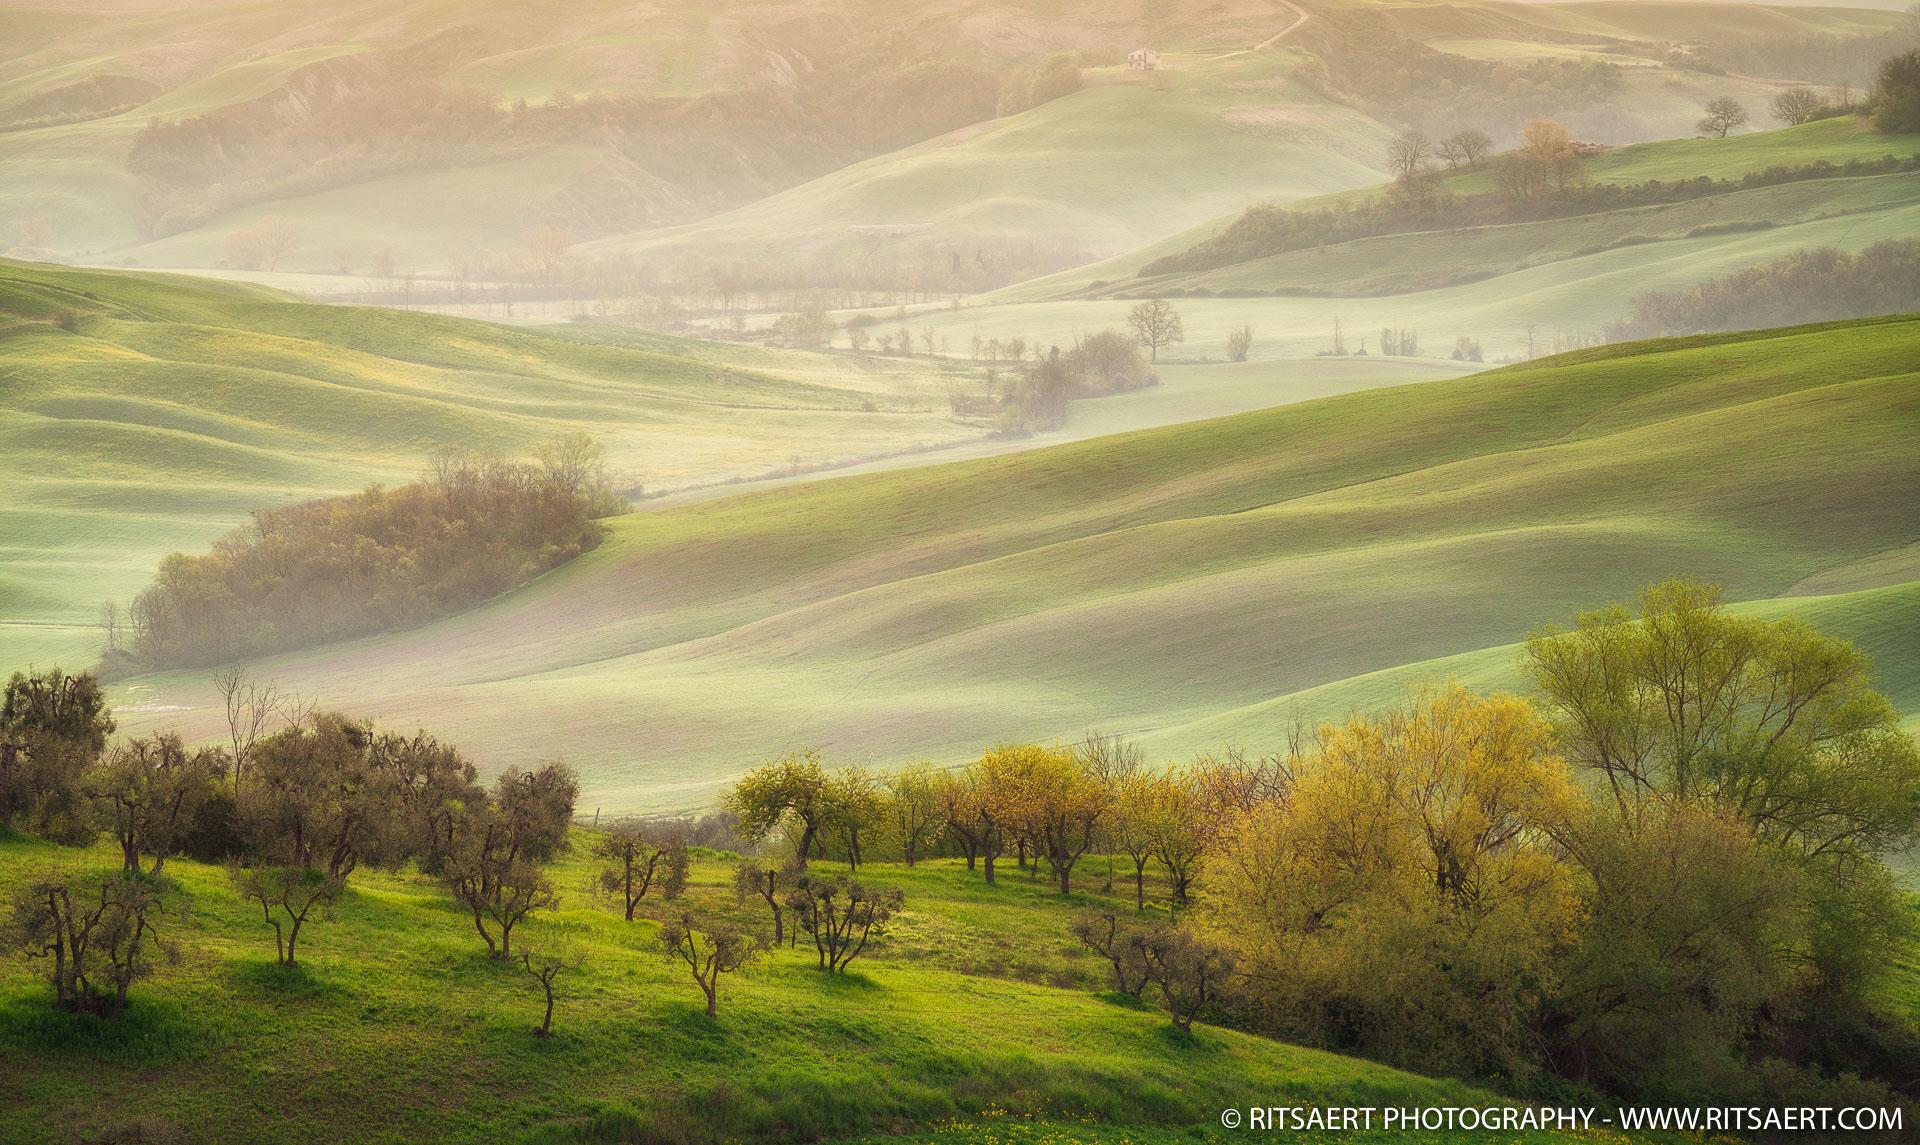 Spring in Tuscany - Italy